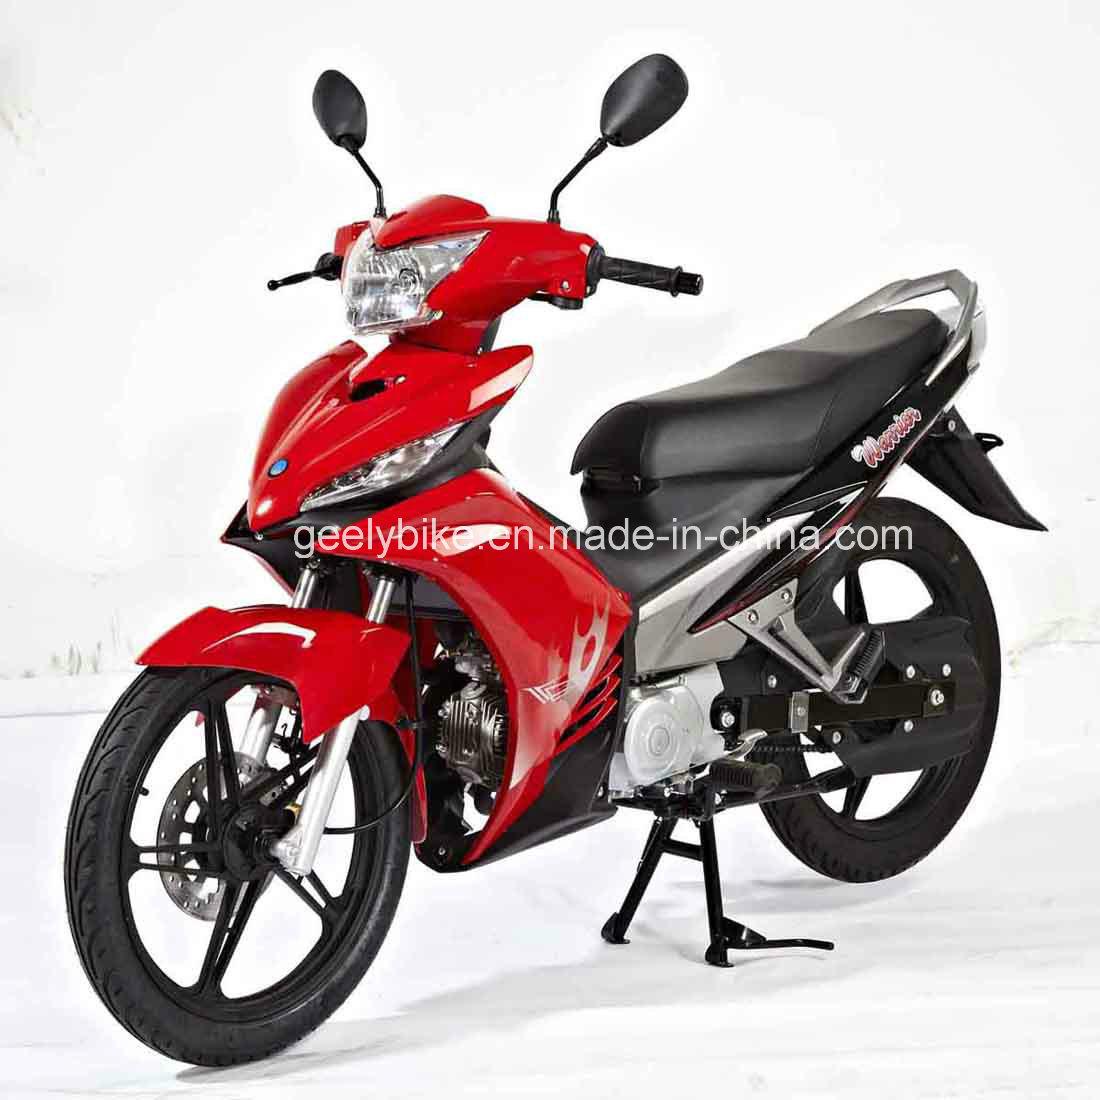 Economic 110cc Cub Motorcycle (JL110-20)